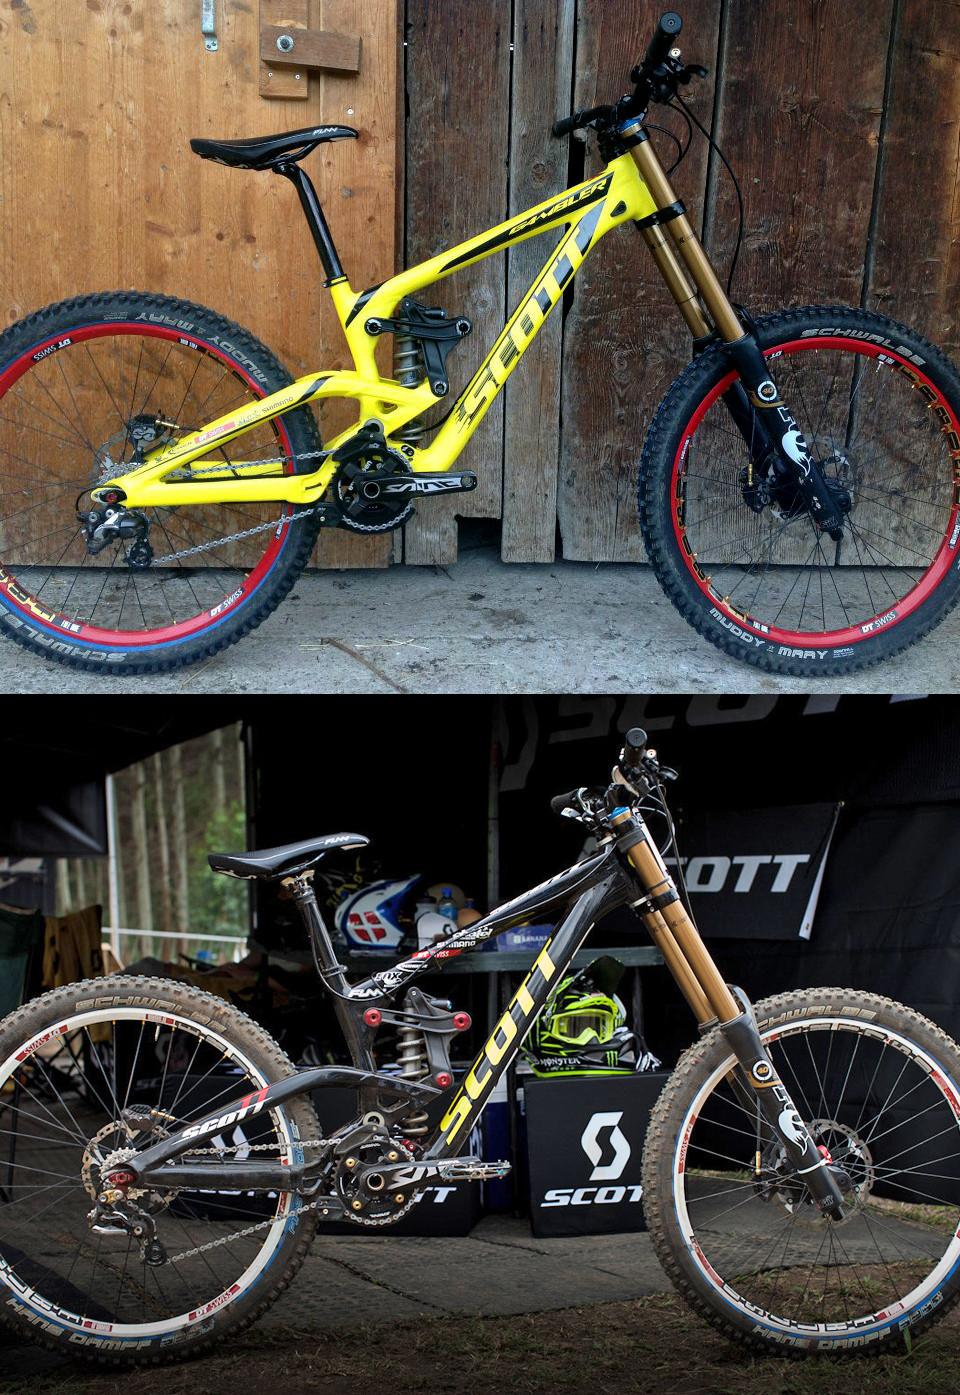 New and Old Scott Gambler Prototypes - Brendan Fairclough's Updated Scott Gambler Prototype - Mountain Biking Pictures - Vital MTB